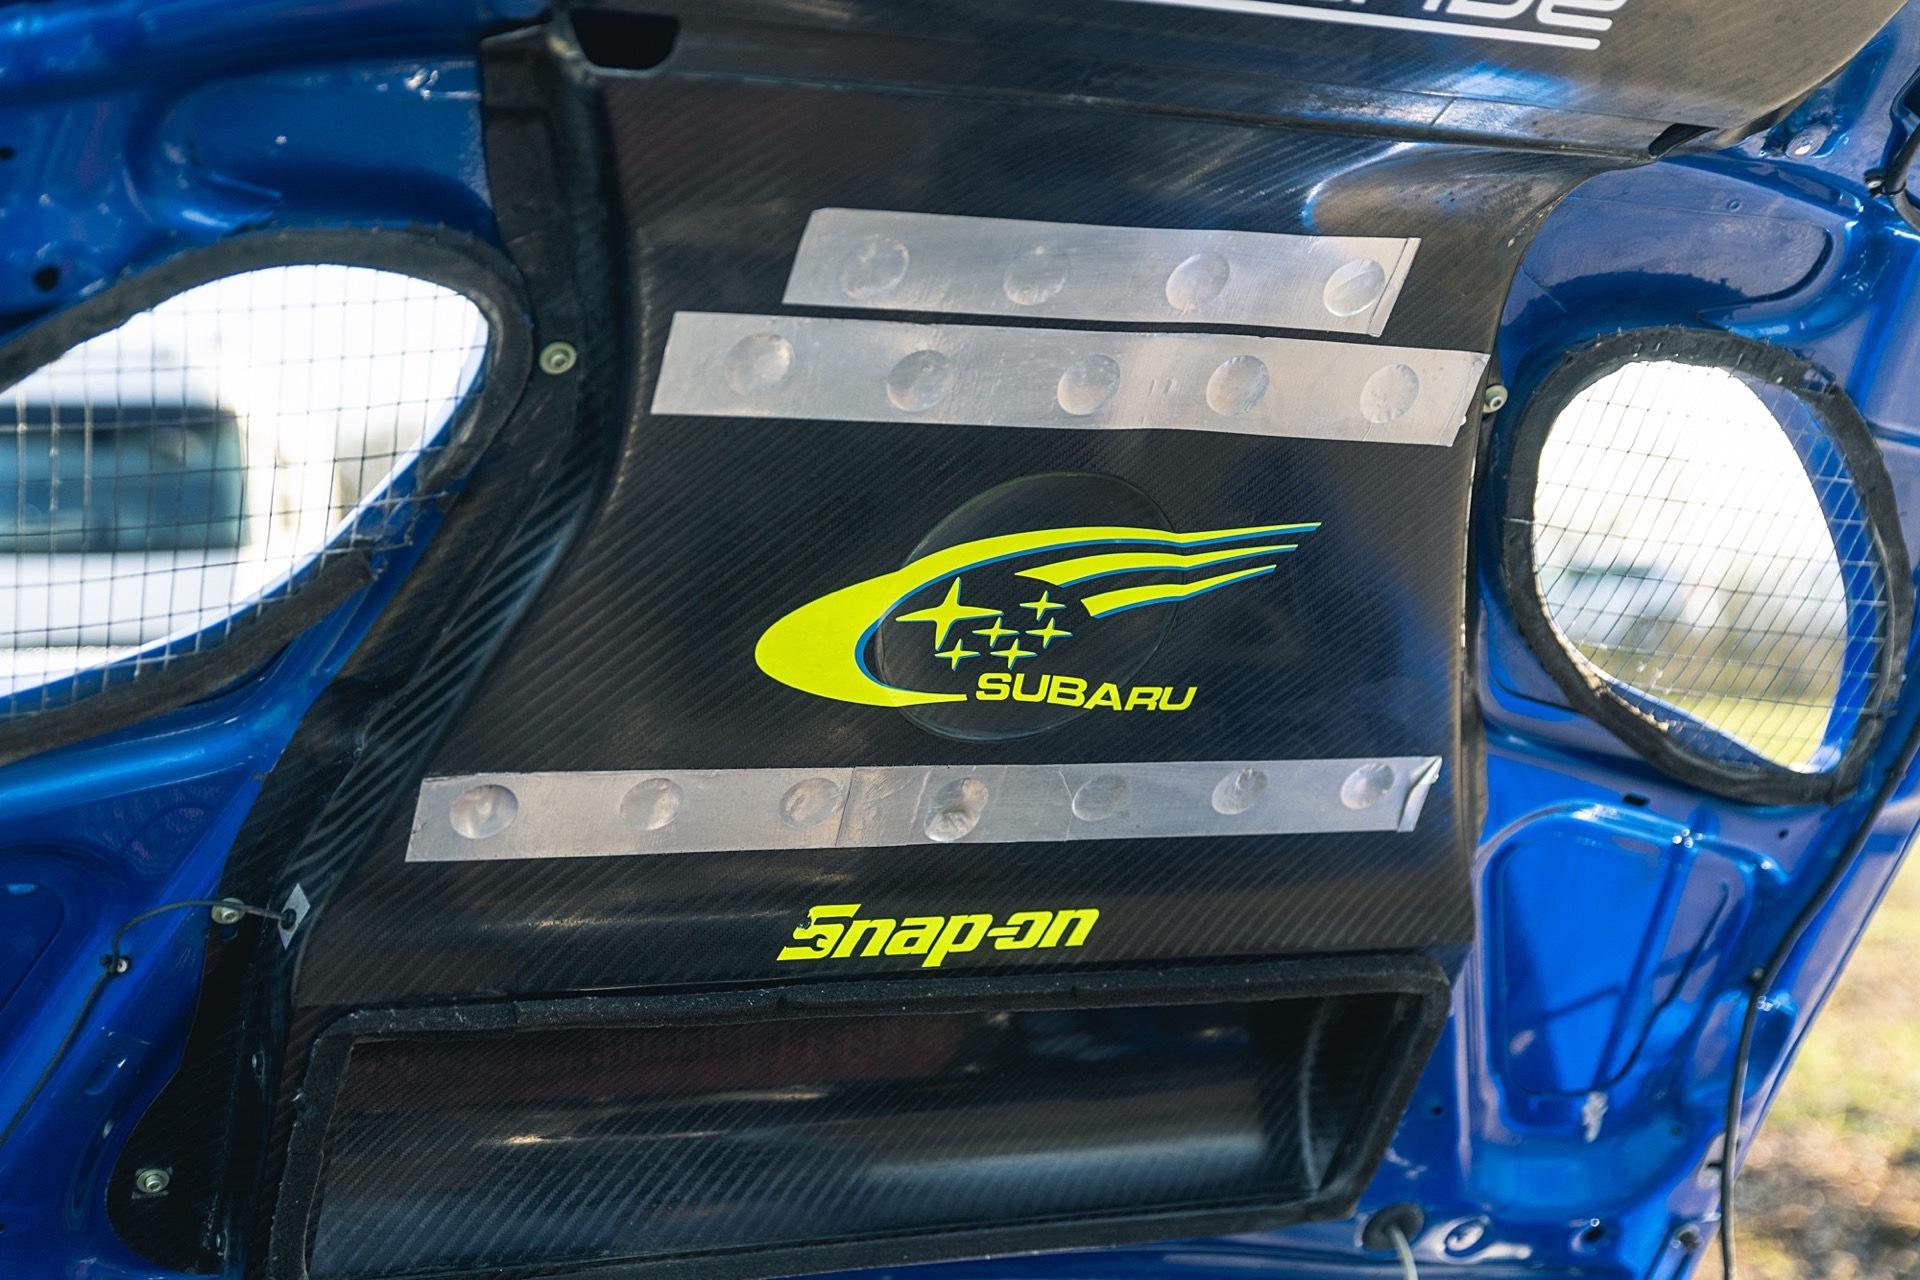 Richard_Burns_Subaru_Impreza_WRC_sale-0007